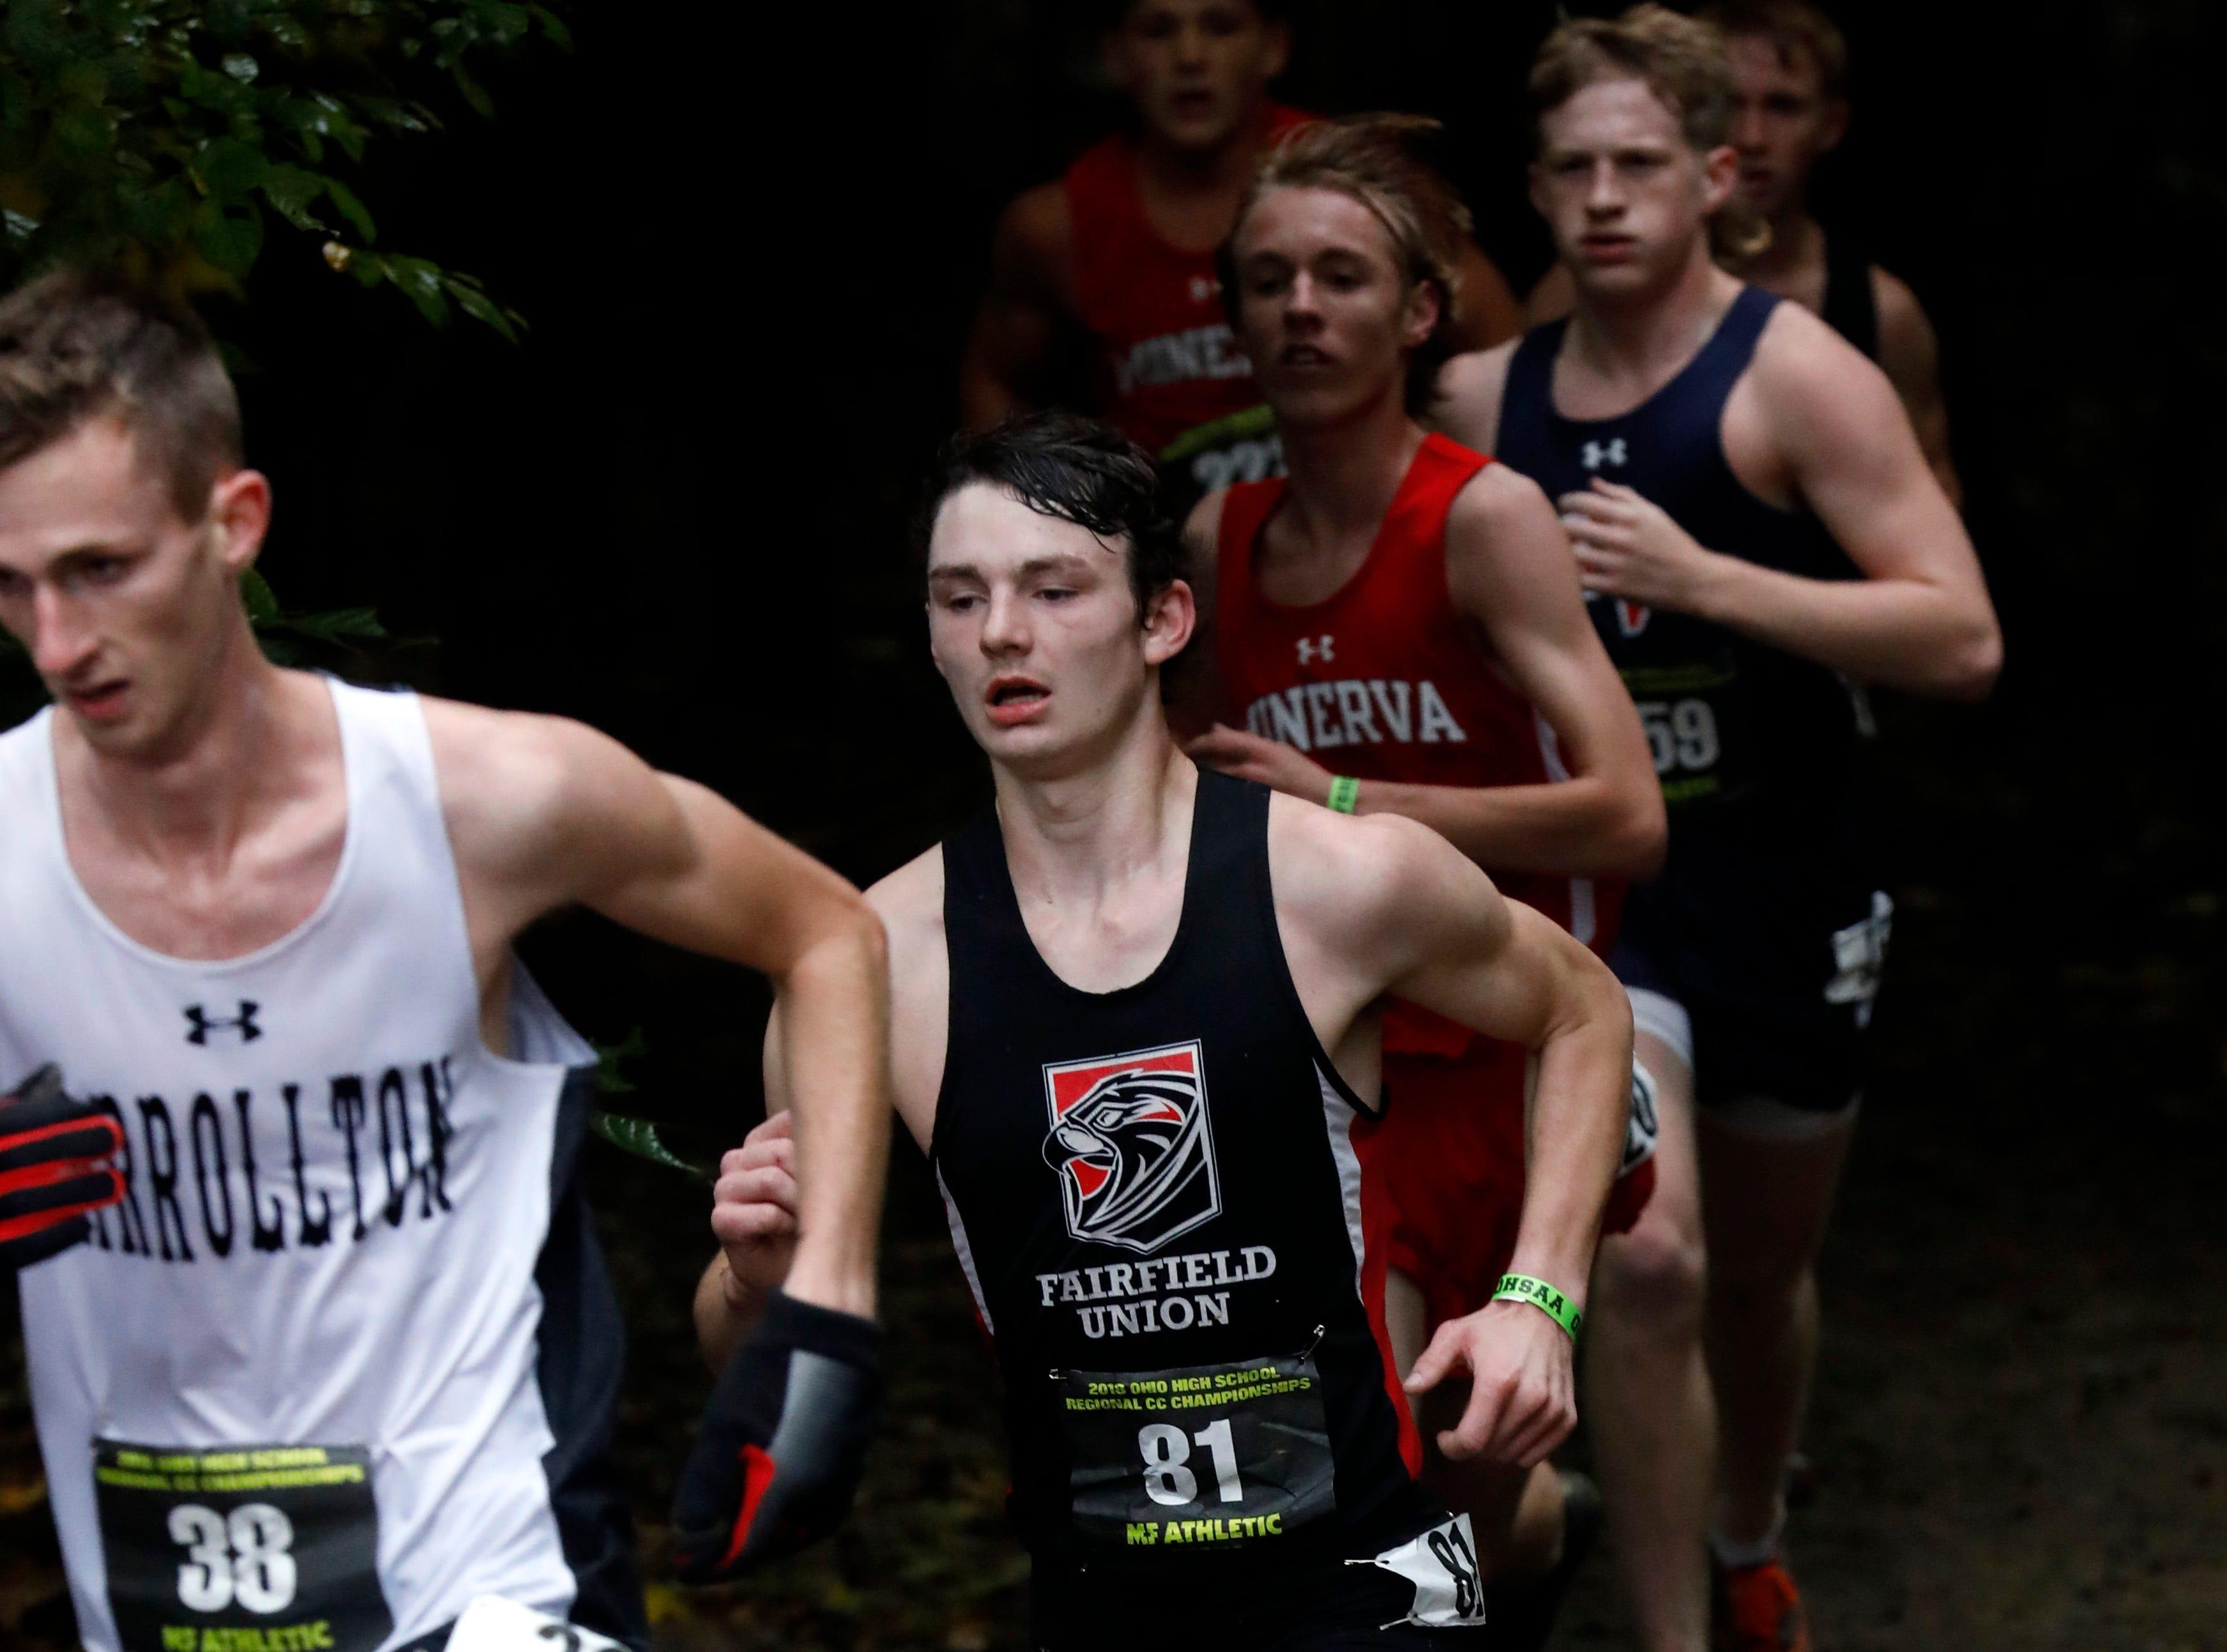 Fairfield Union's Jeffrey Kovatch runs in the Regional Cross Country meet Saturday, Oct. 27, 2018, at Pickerington North High School in Pickerington.